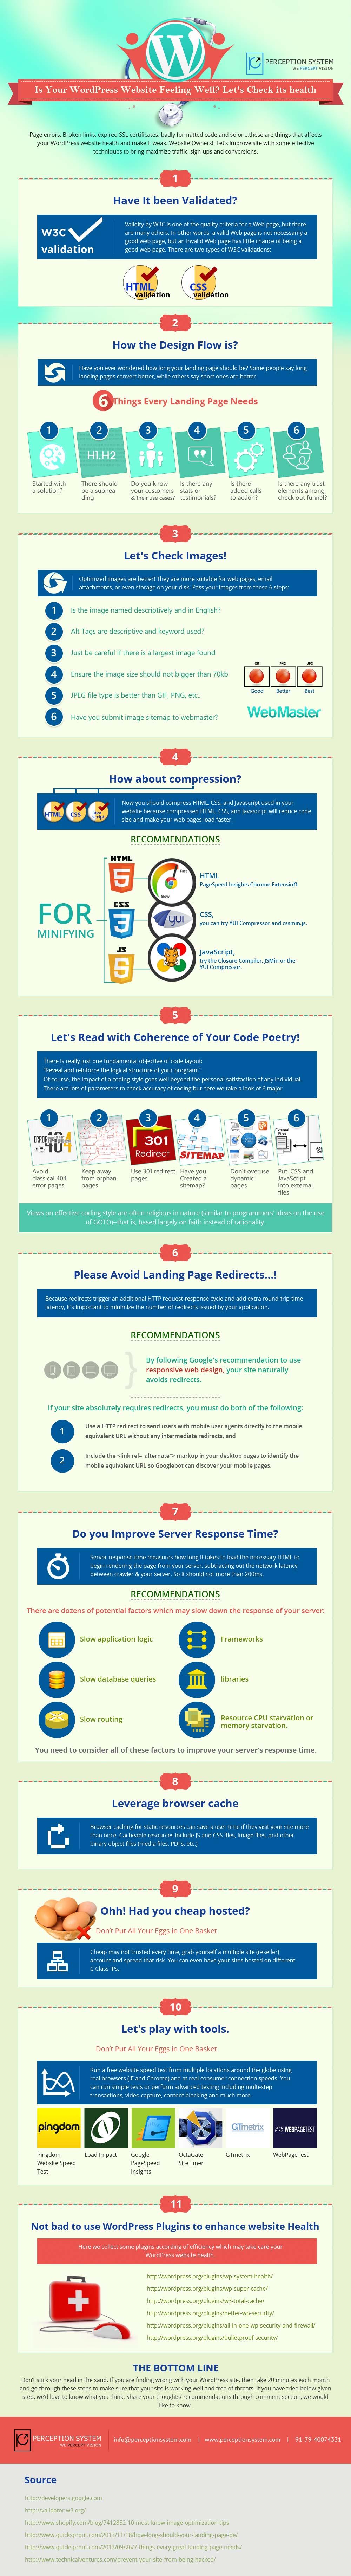 Best Way to Run a WordPress Site